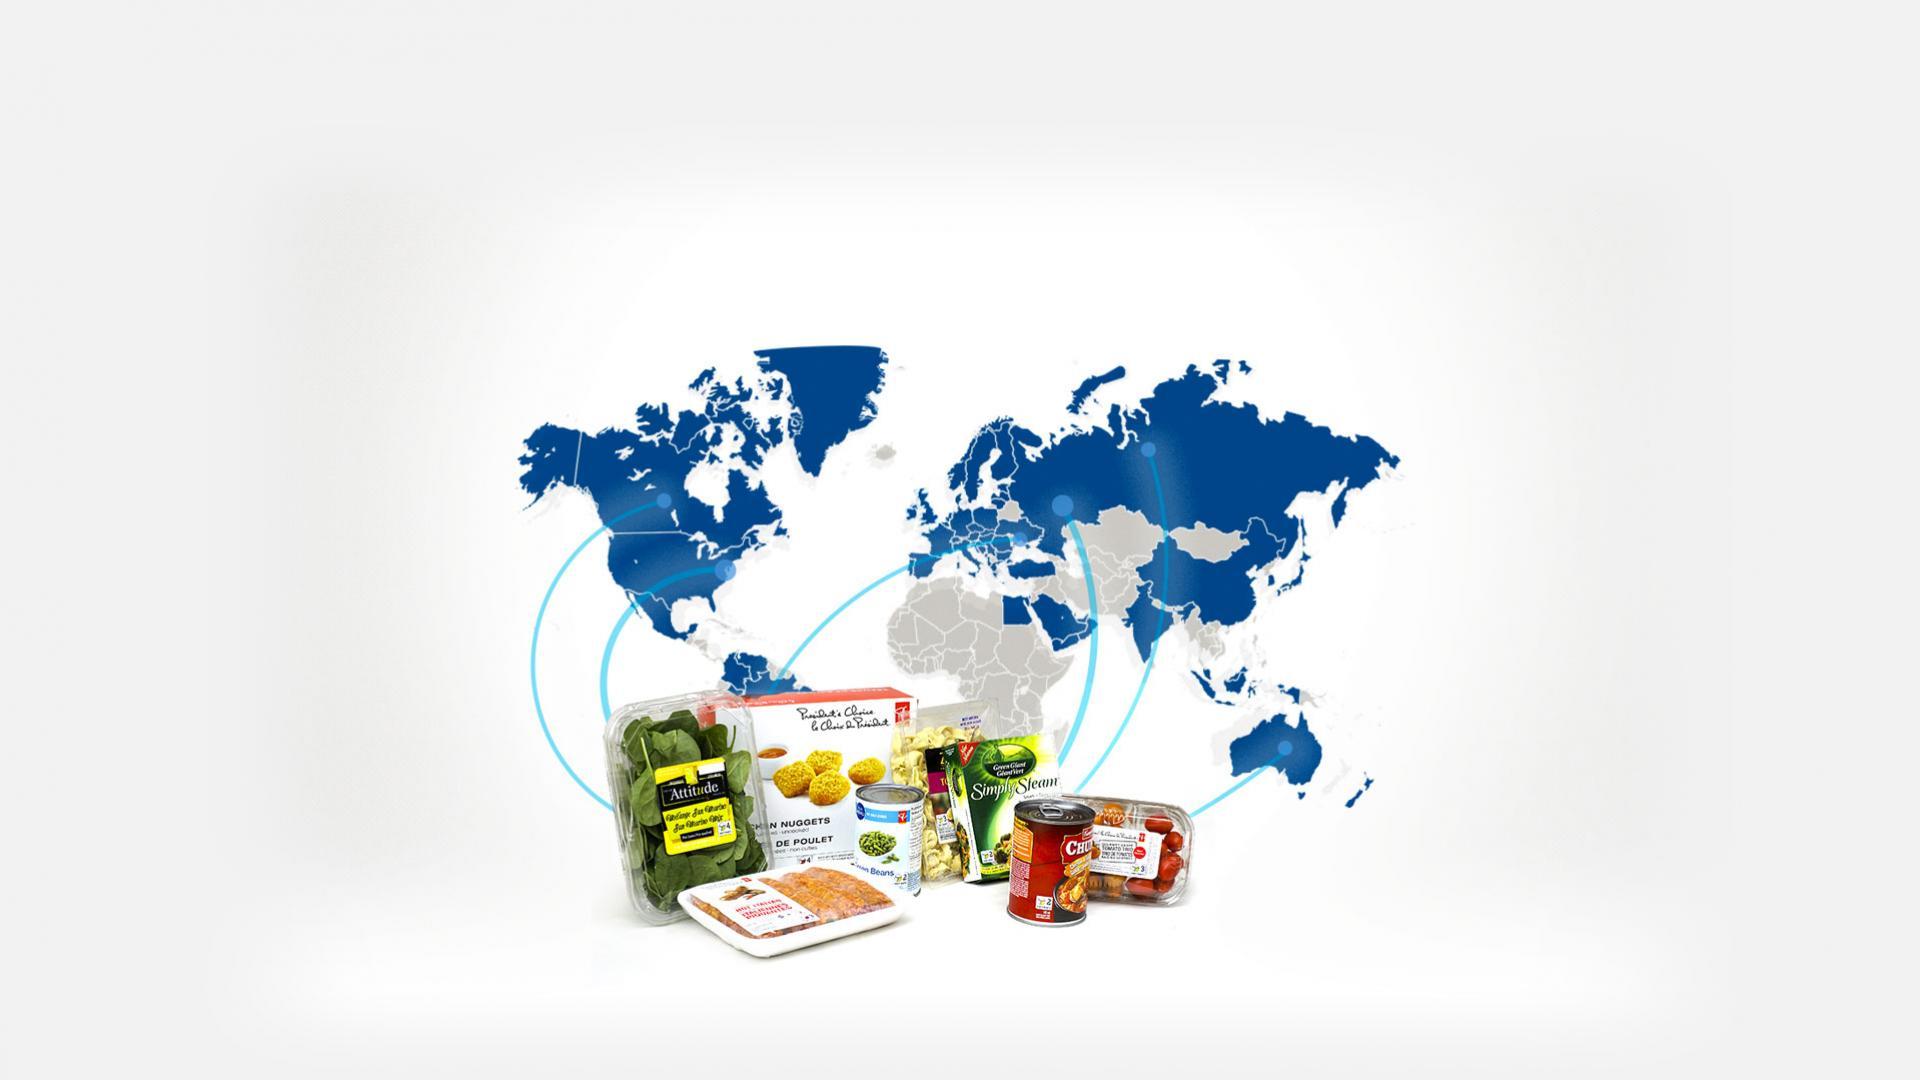 Mérieux NutriSciences-Labeling and regulatory